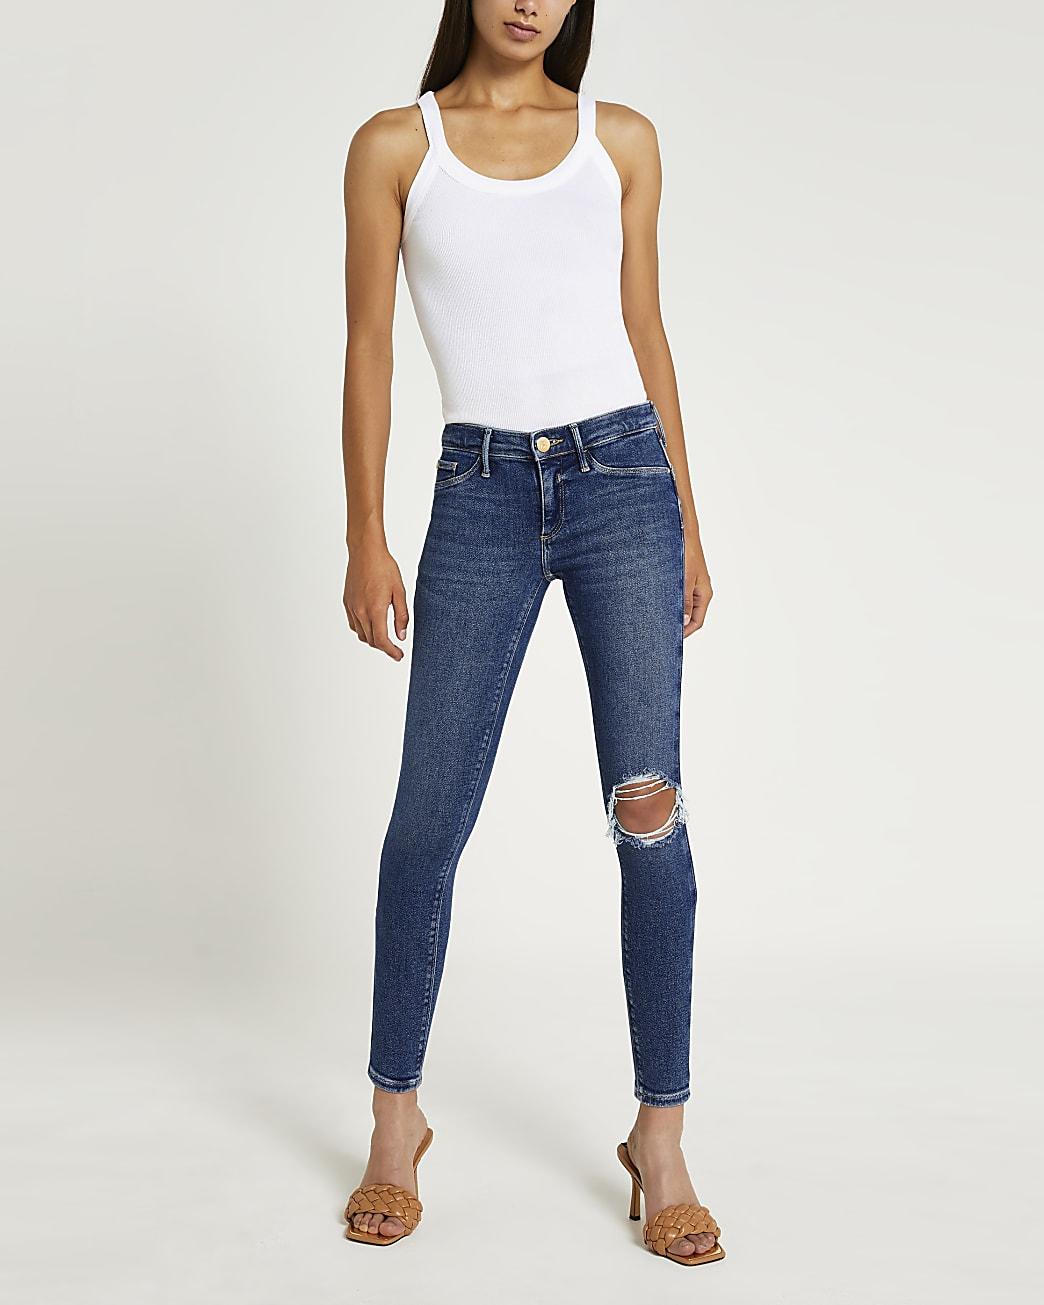 Blue ripped low rise bum sculpt skinny jeans